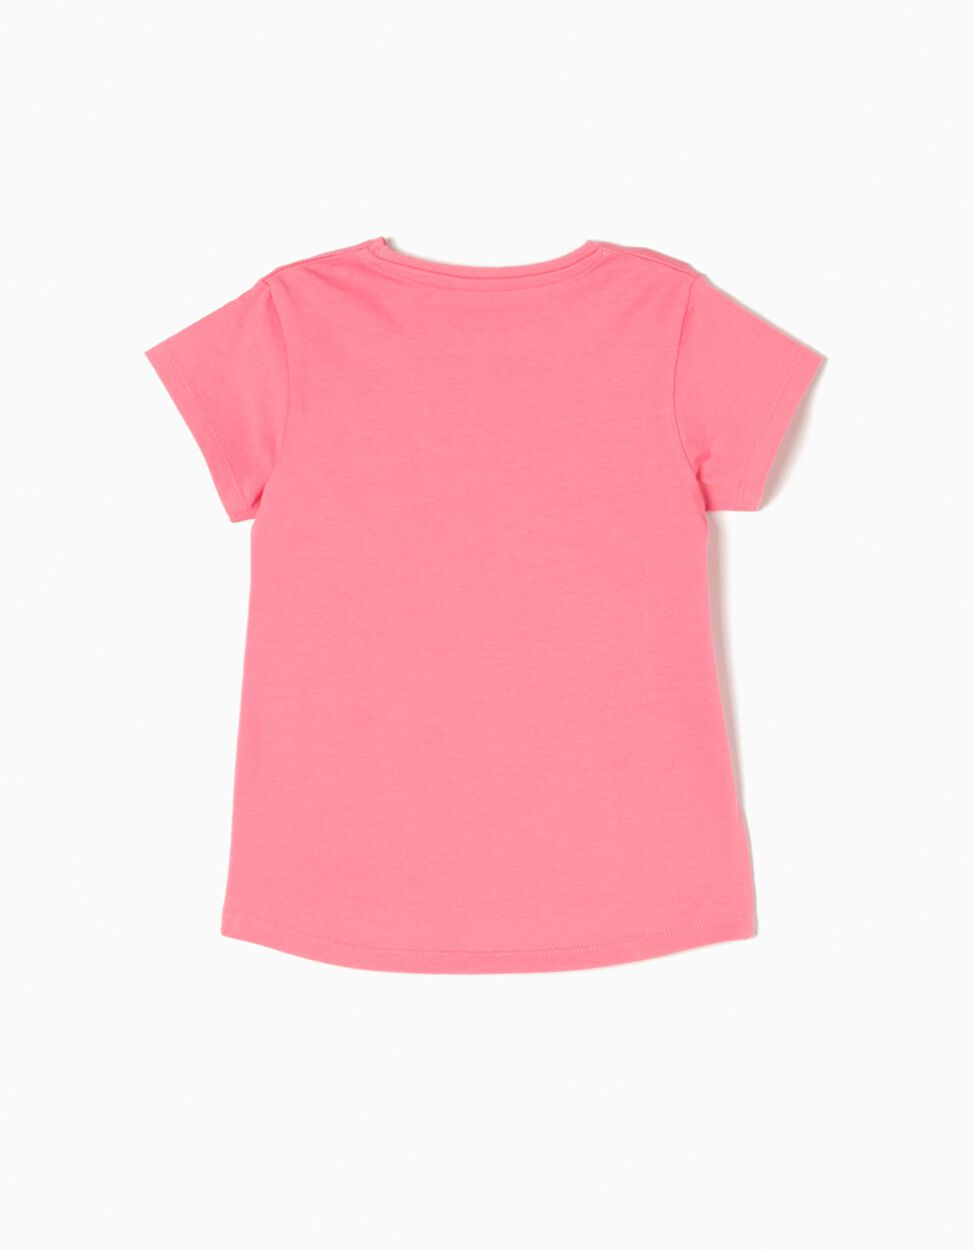 Camiseta Girls Rosa